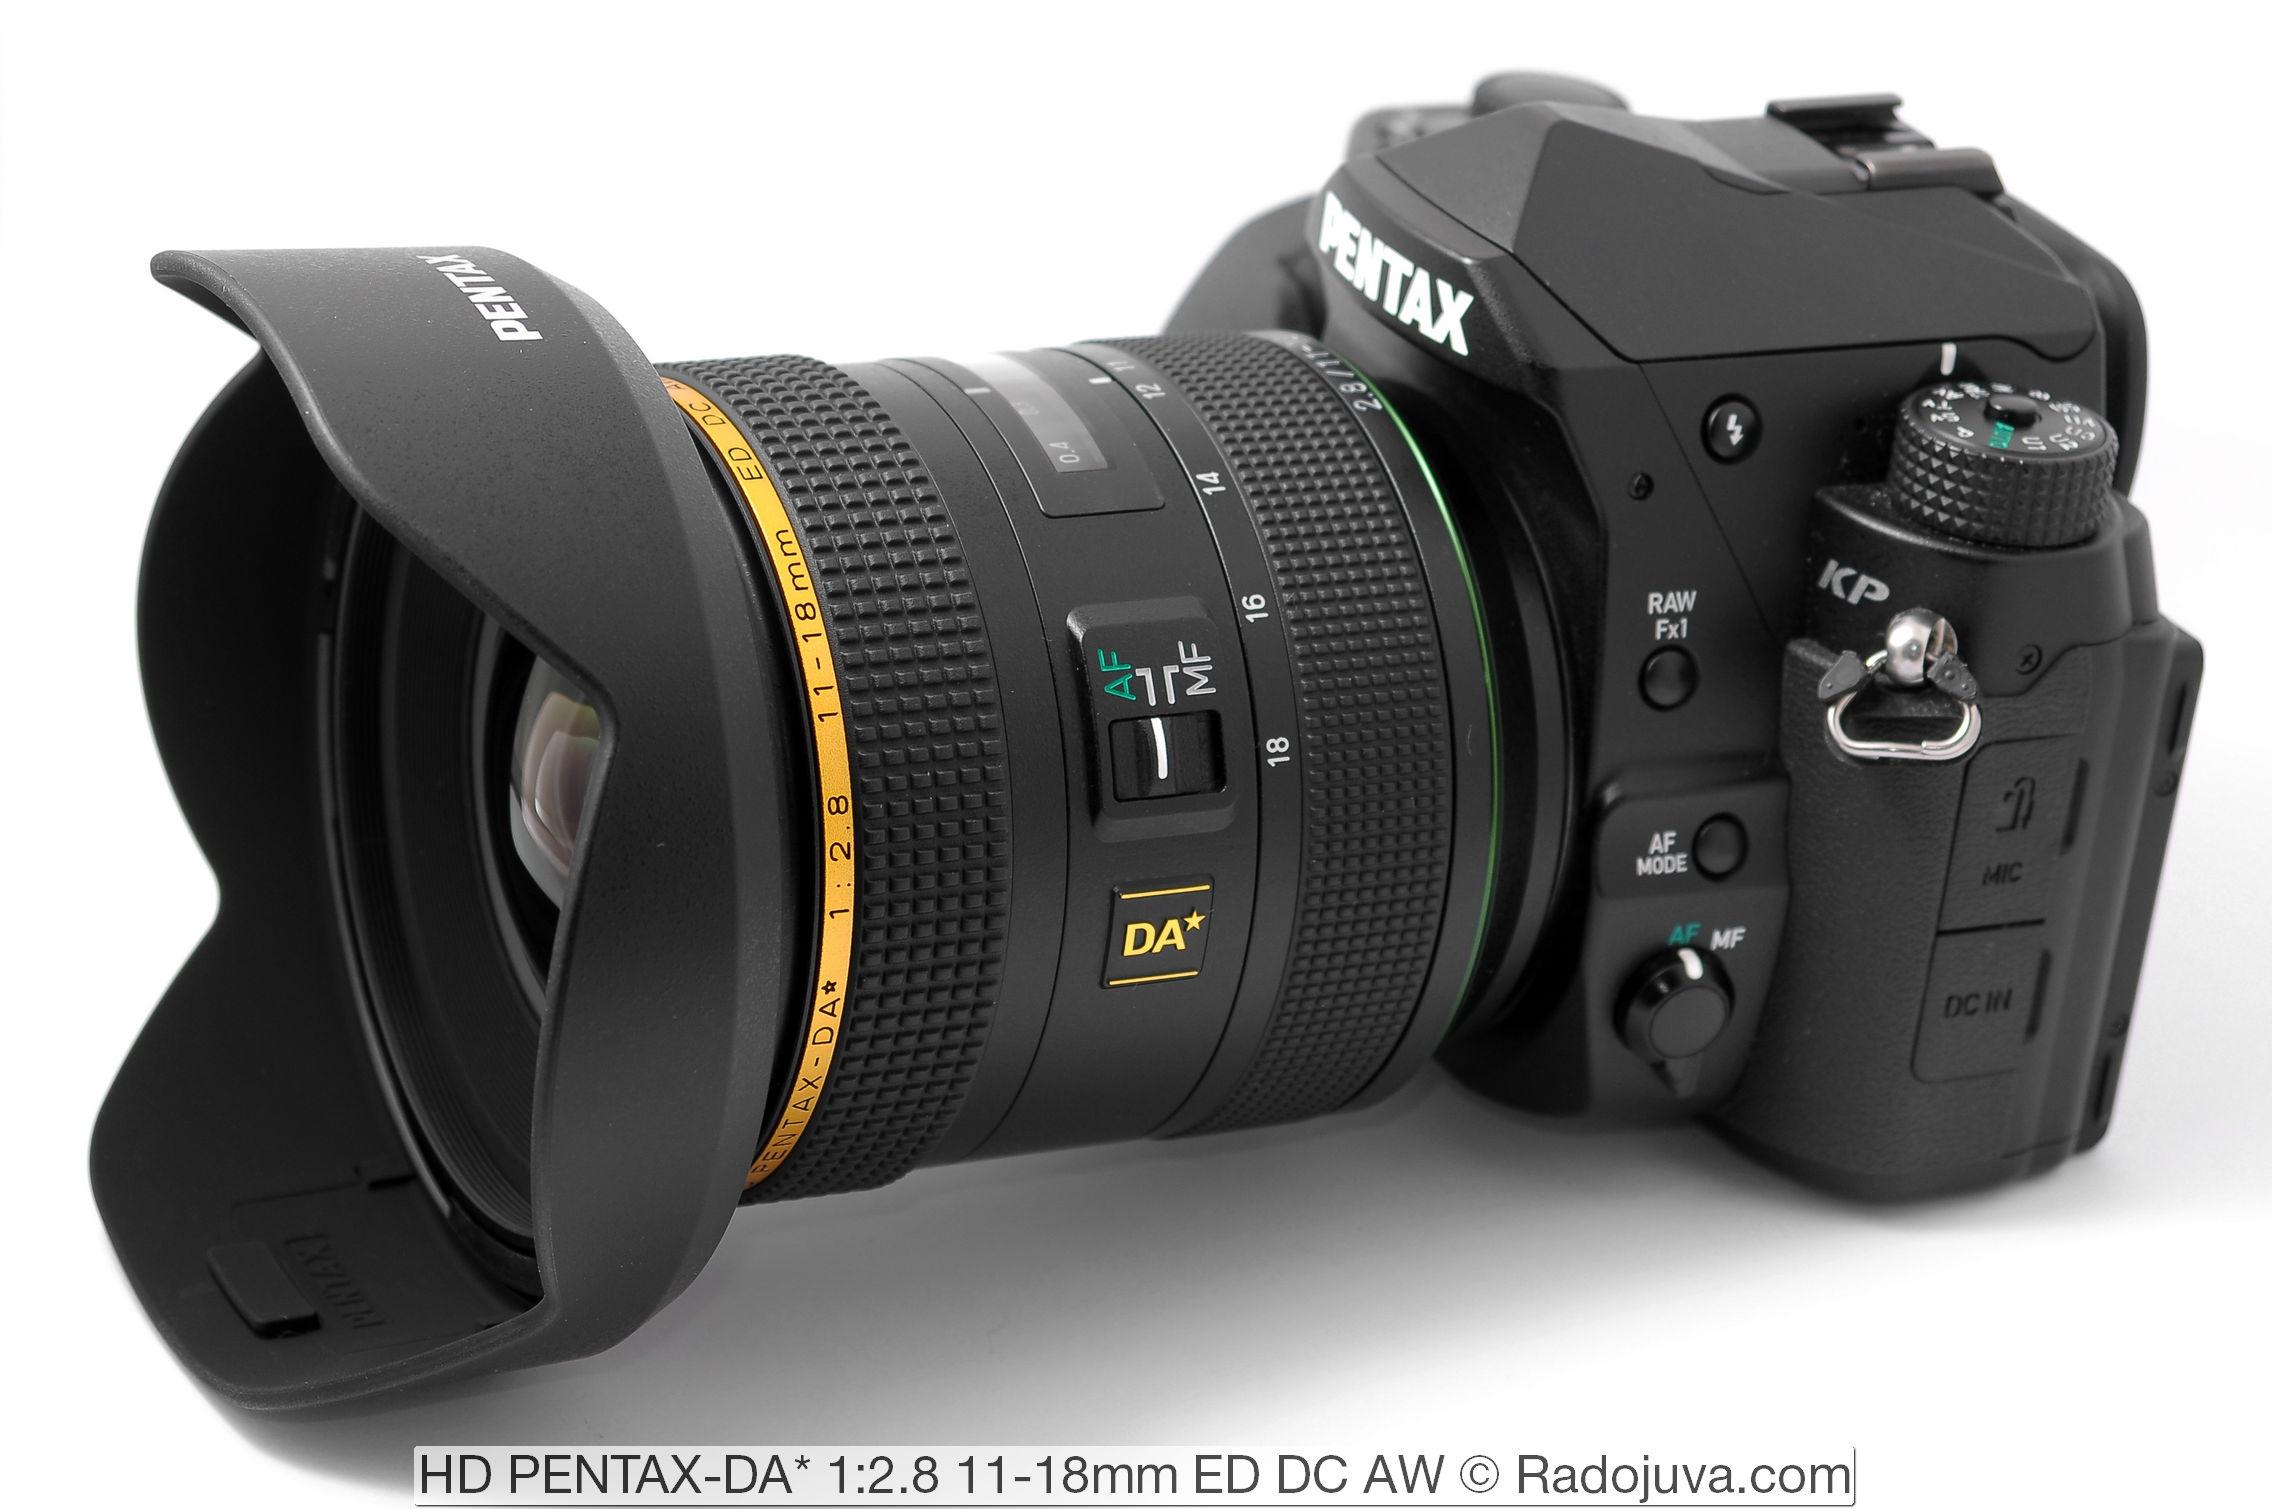 HD PENTAX-DA* 1:2.8 11-18mm ED DC AW